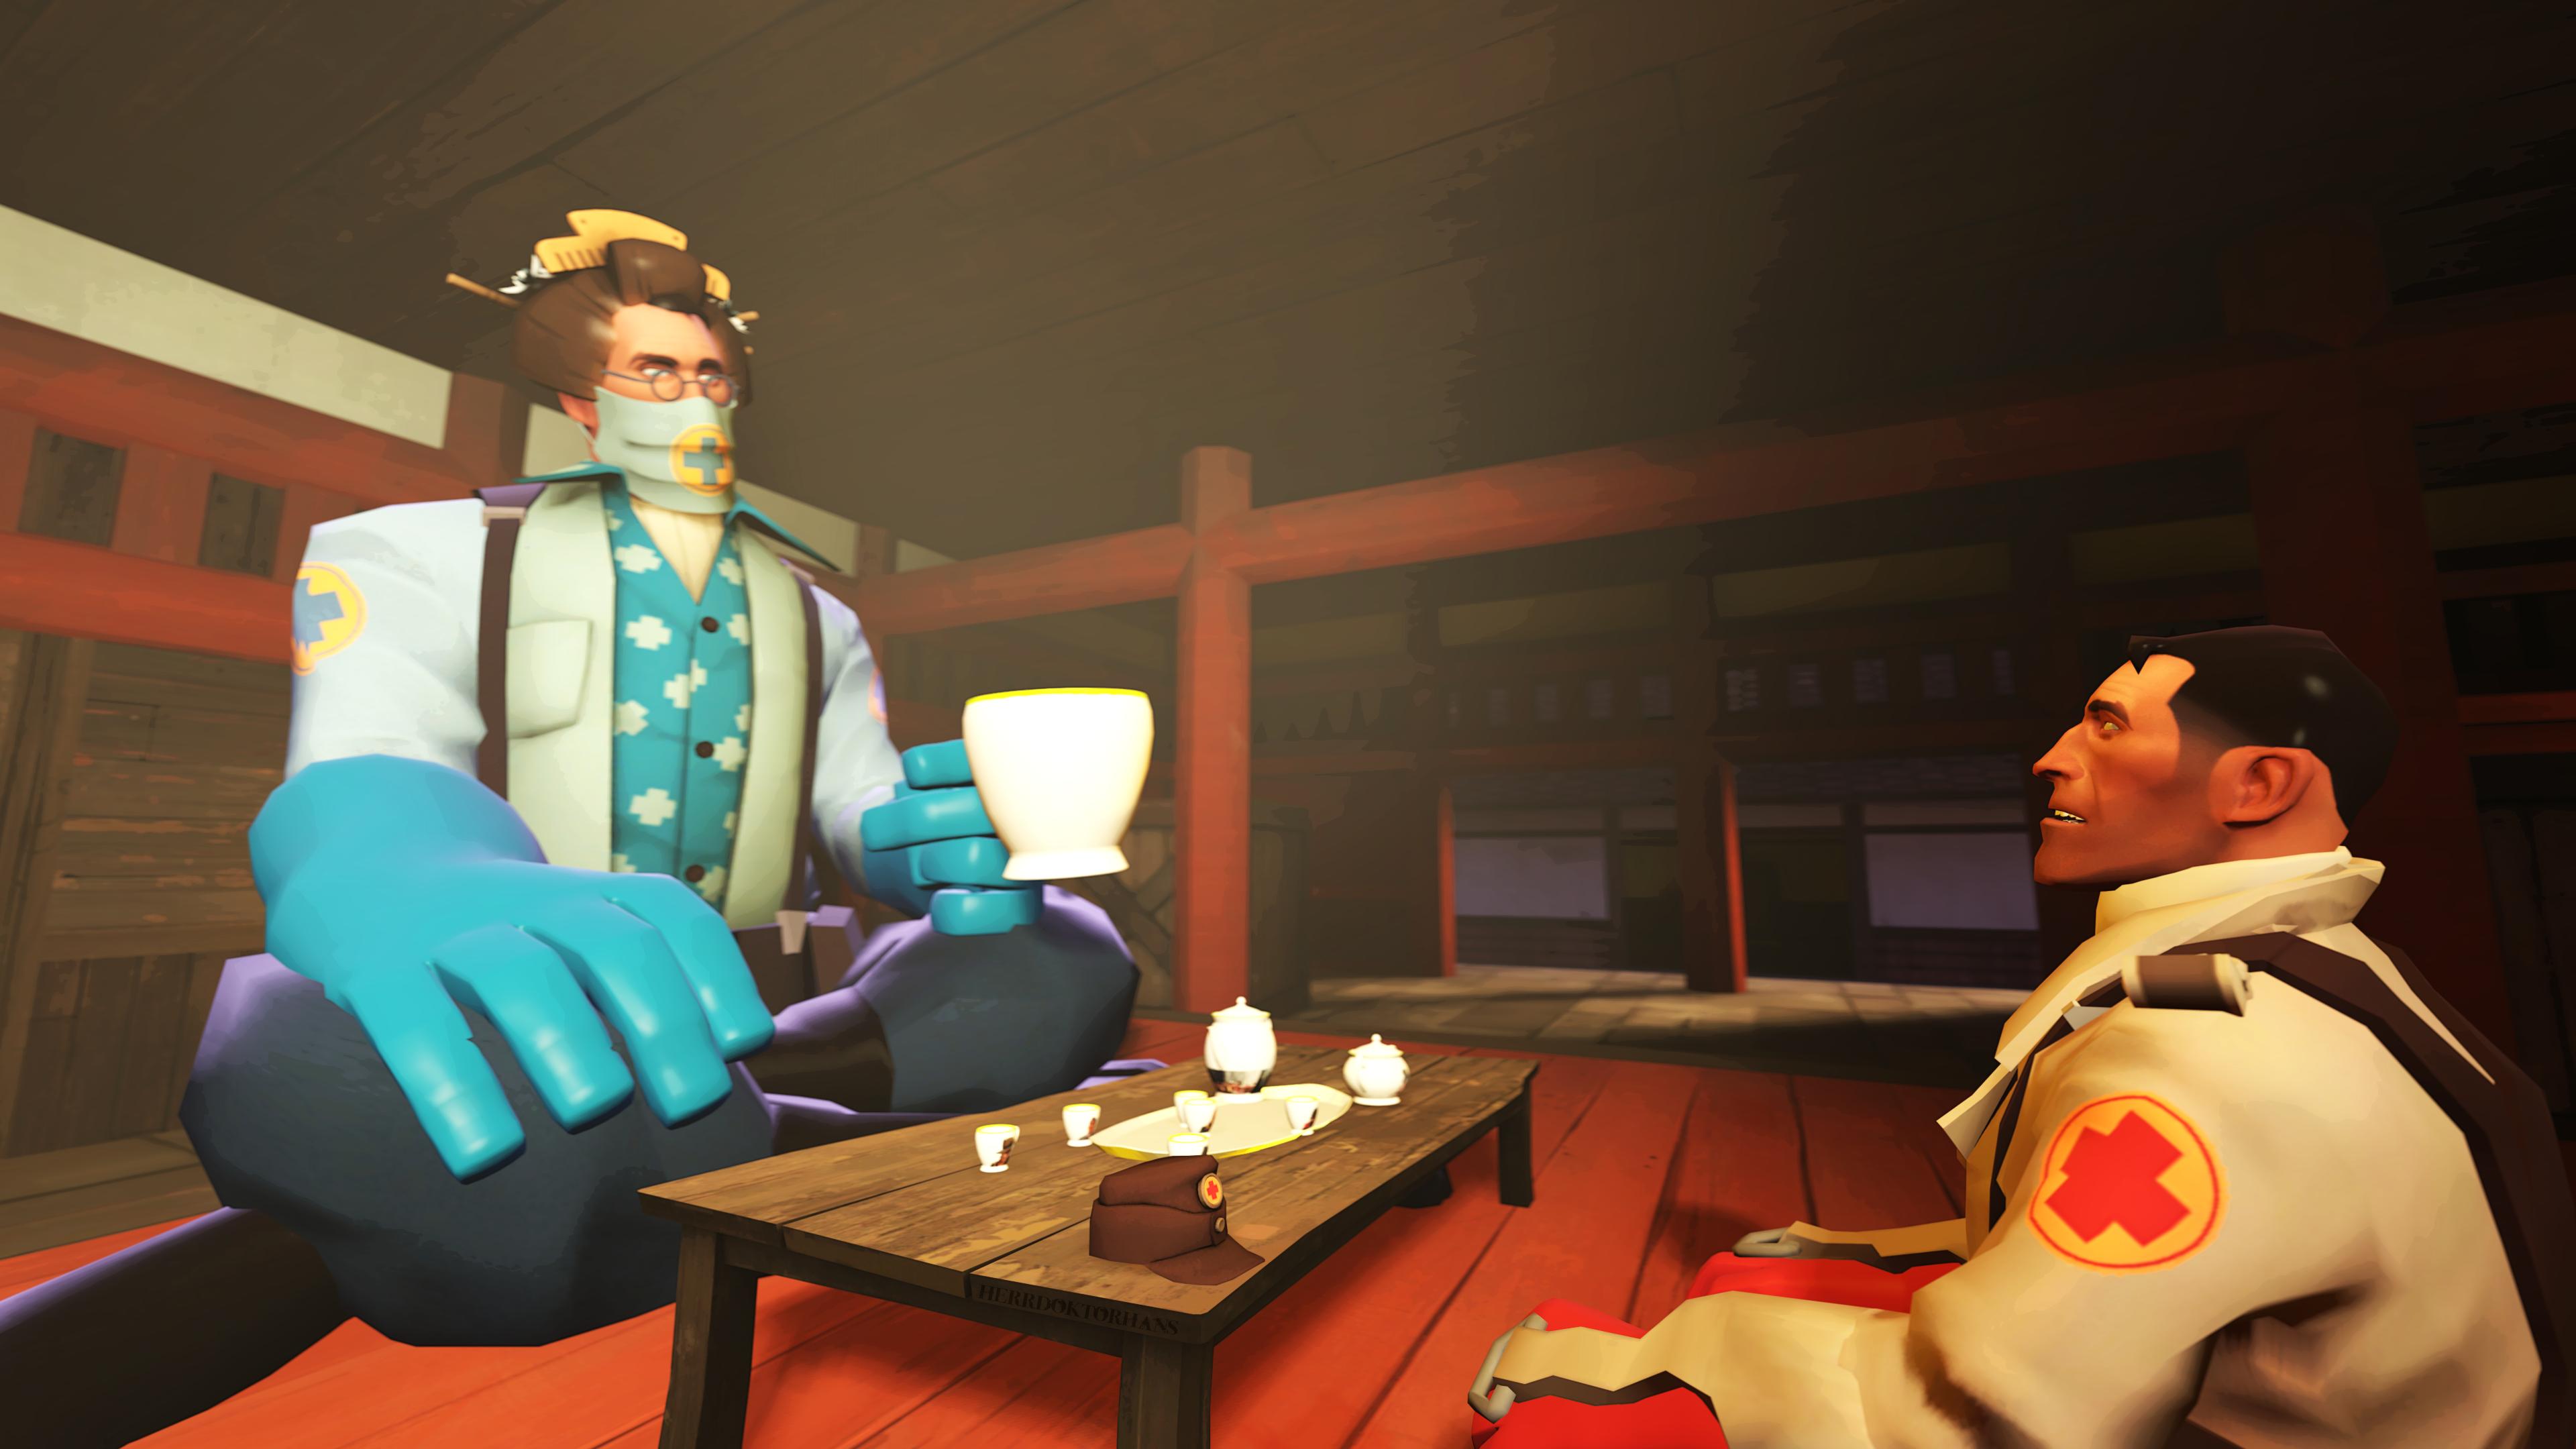 [SFM-CONTEST] Tea time by HerrdoktorHans